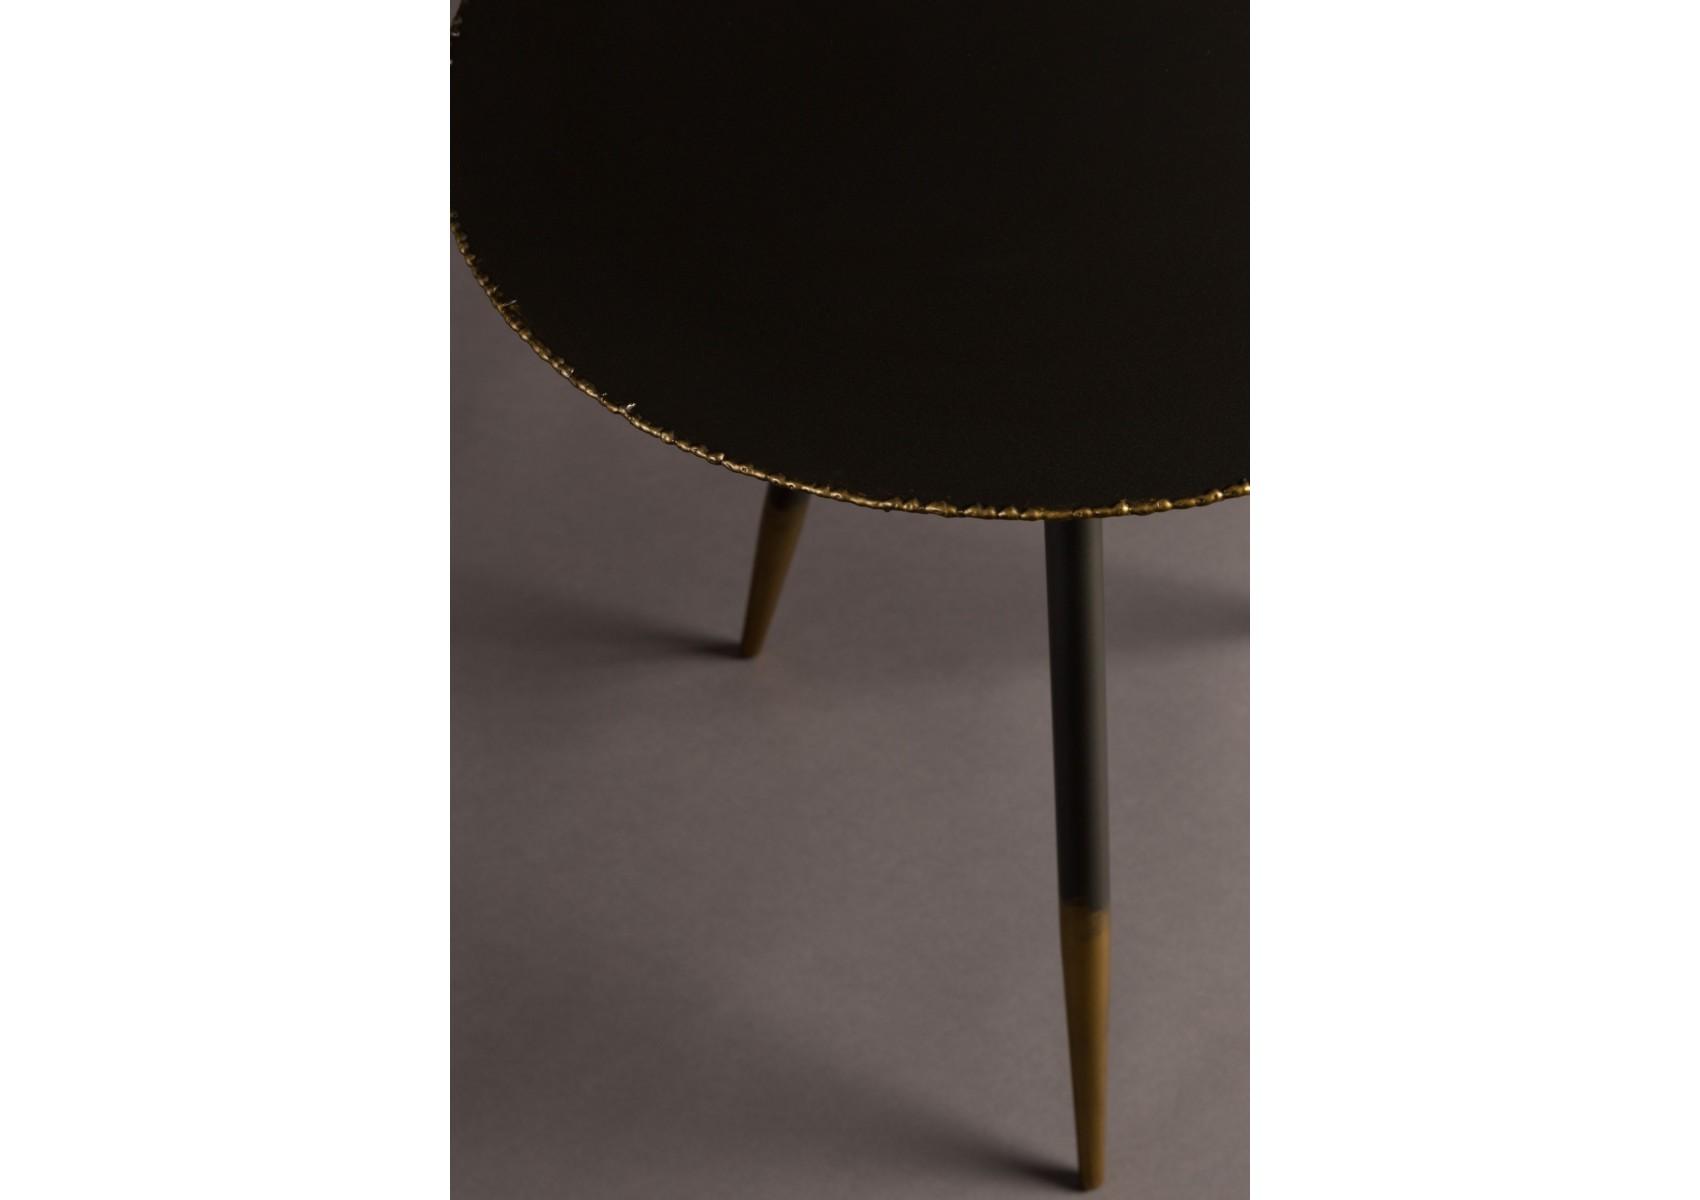 lot de 2 tables basses stalwart noir et or de chez dutchbone. Black Bedroom Furniture Sets. Home Design Ideas